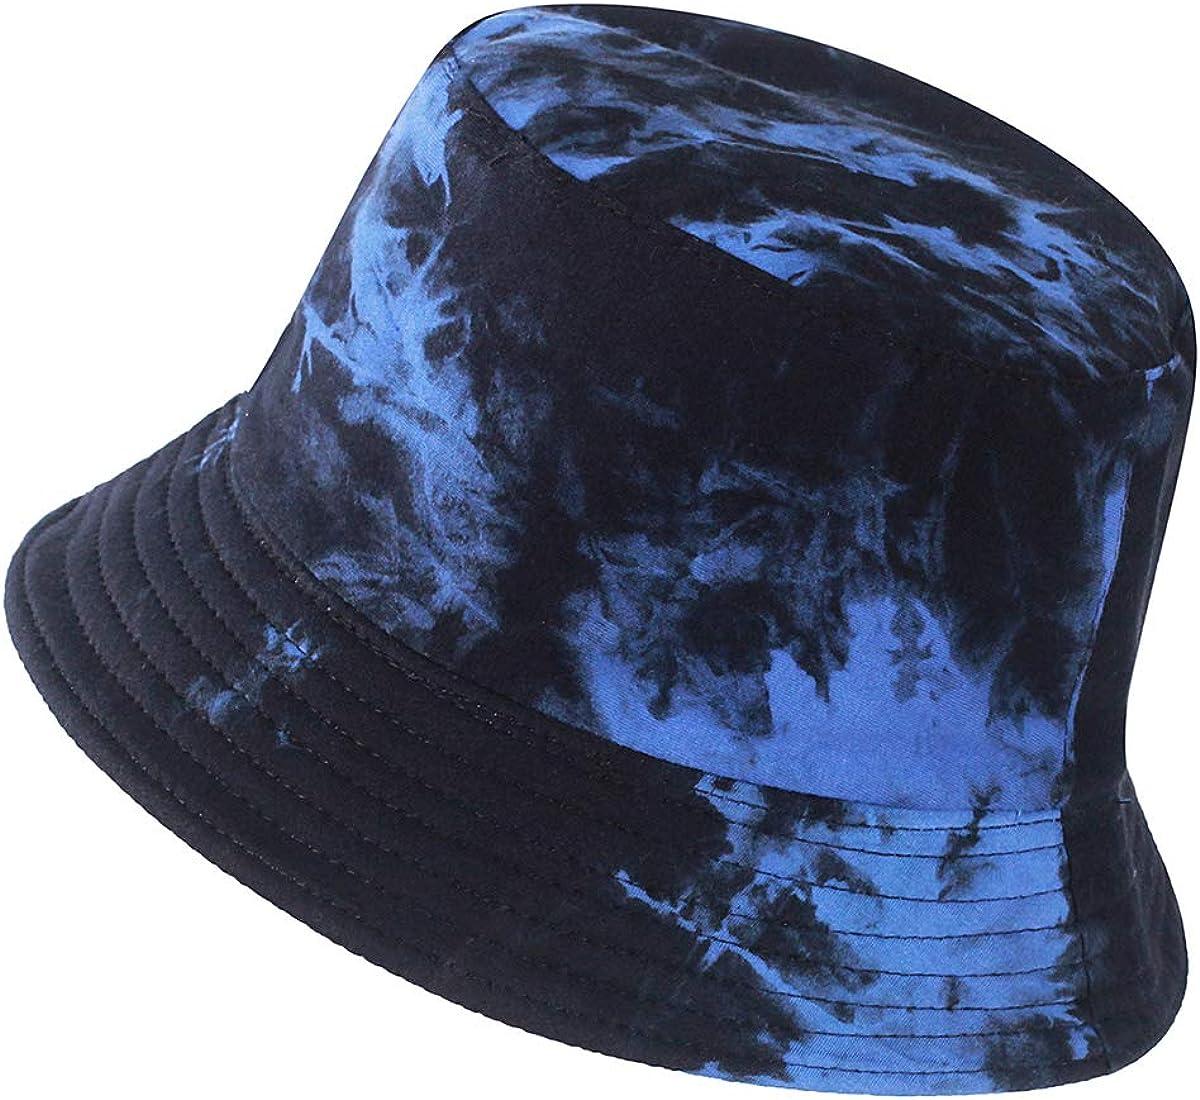 XUYI Cotton Bucket Hats Unisex Tie Dye Hat Outdoor Summer Cap Hiking Beach Sports